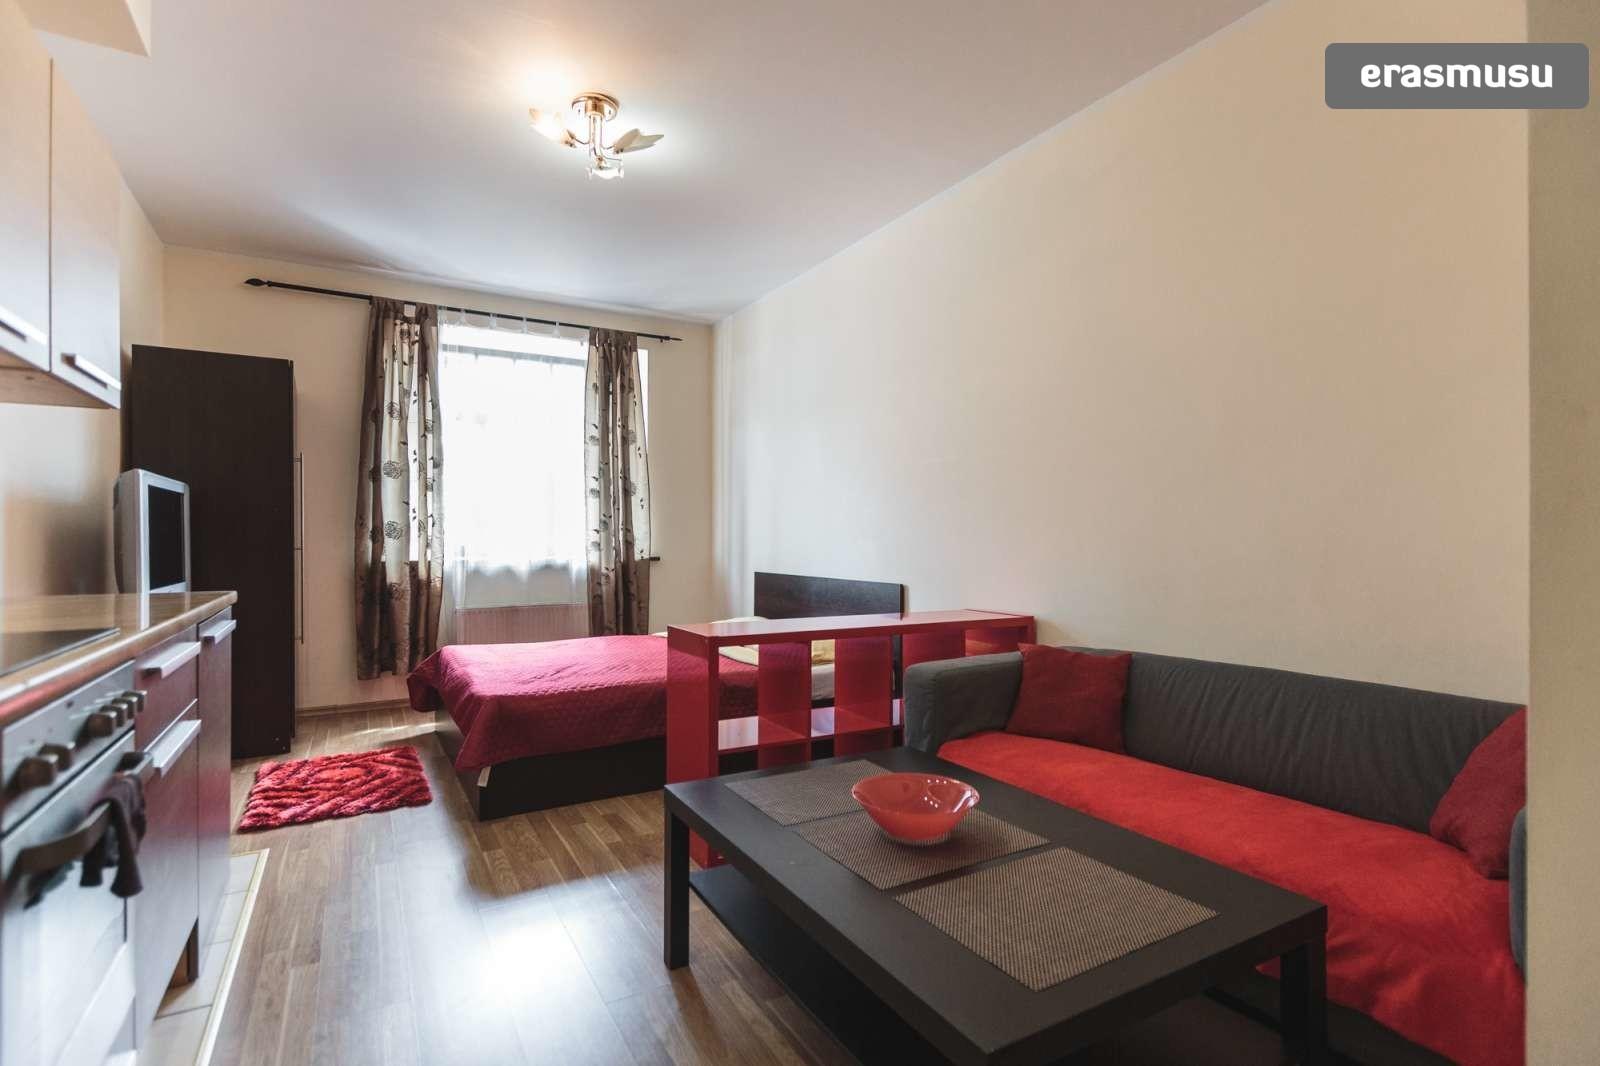 modern-studio-apartment-rent-maskavas-forstate-18ac119cfafd0ed84